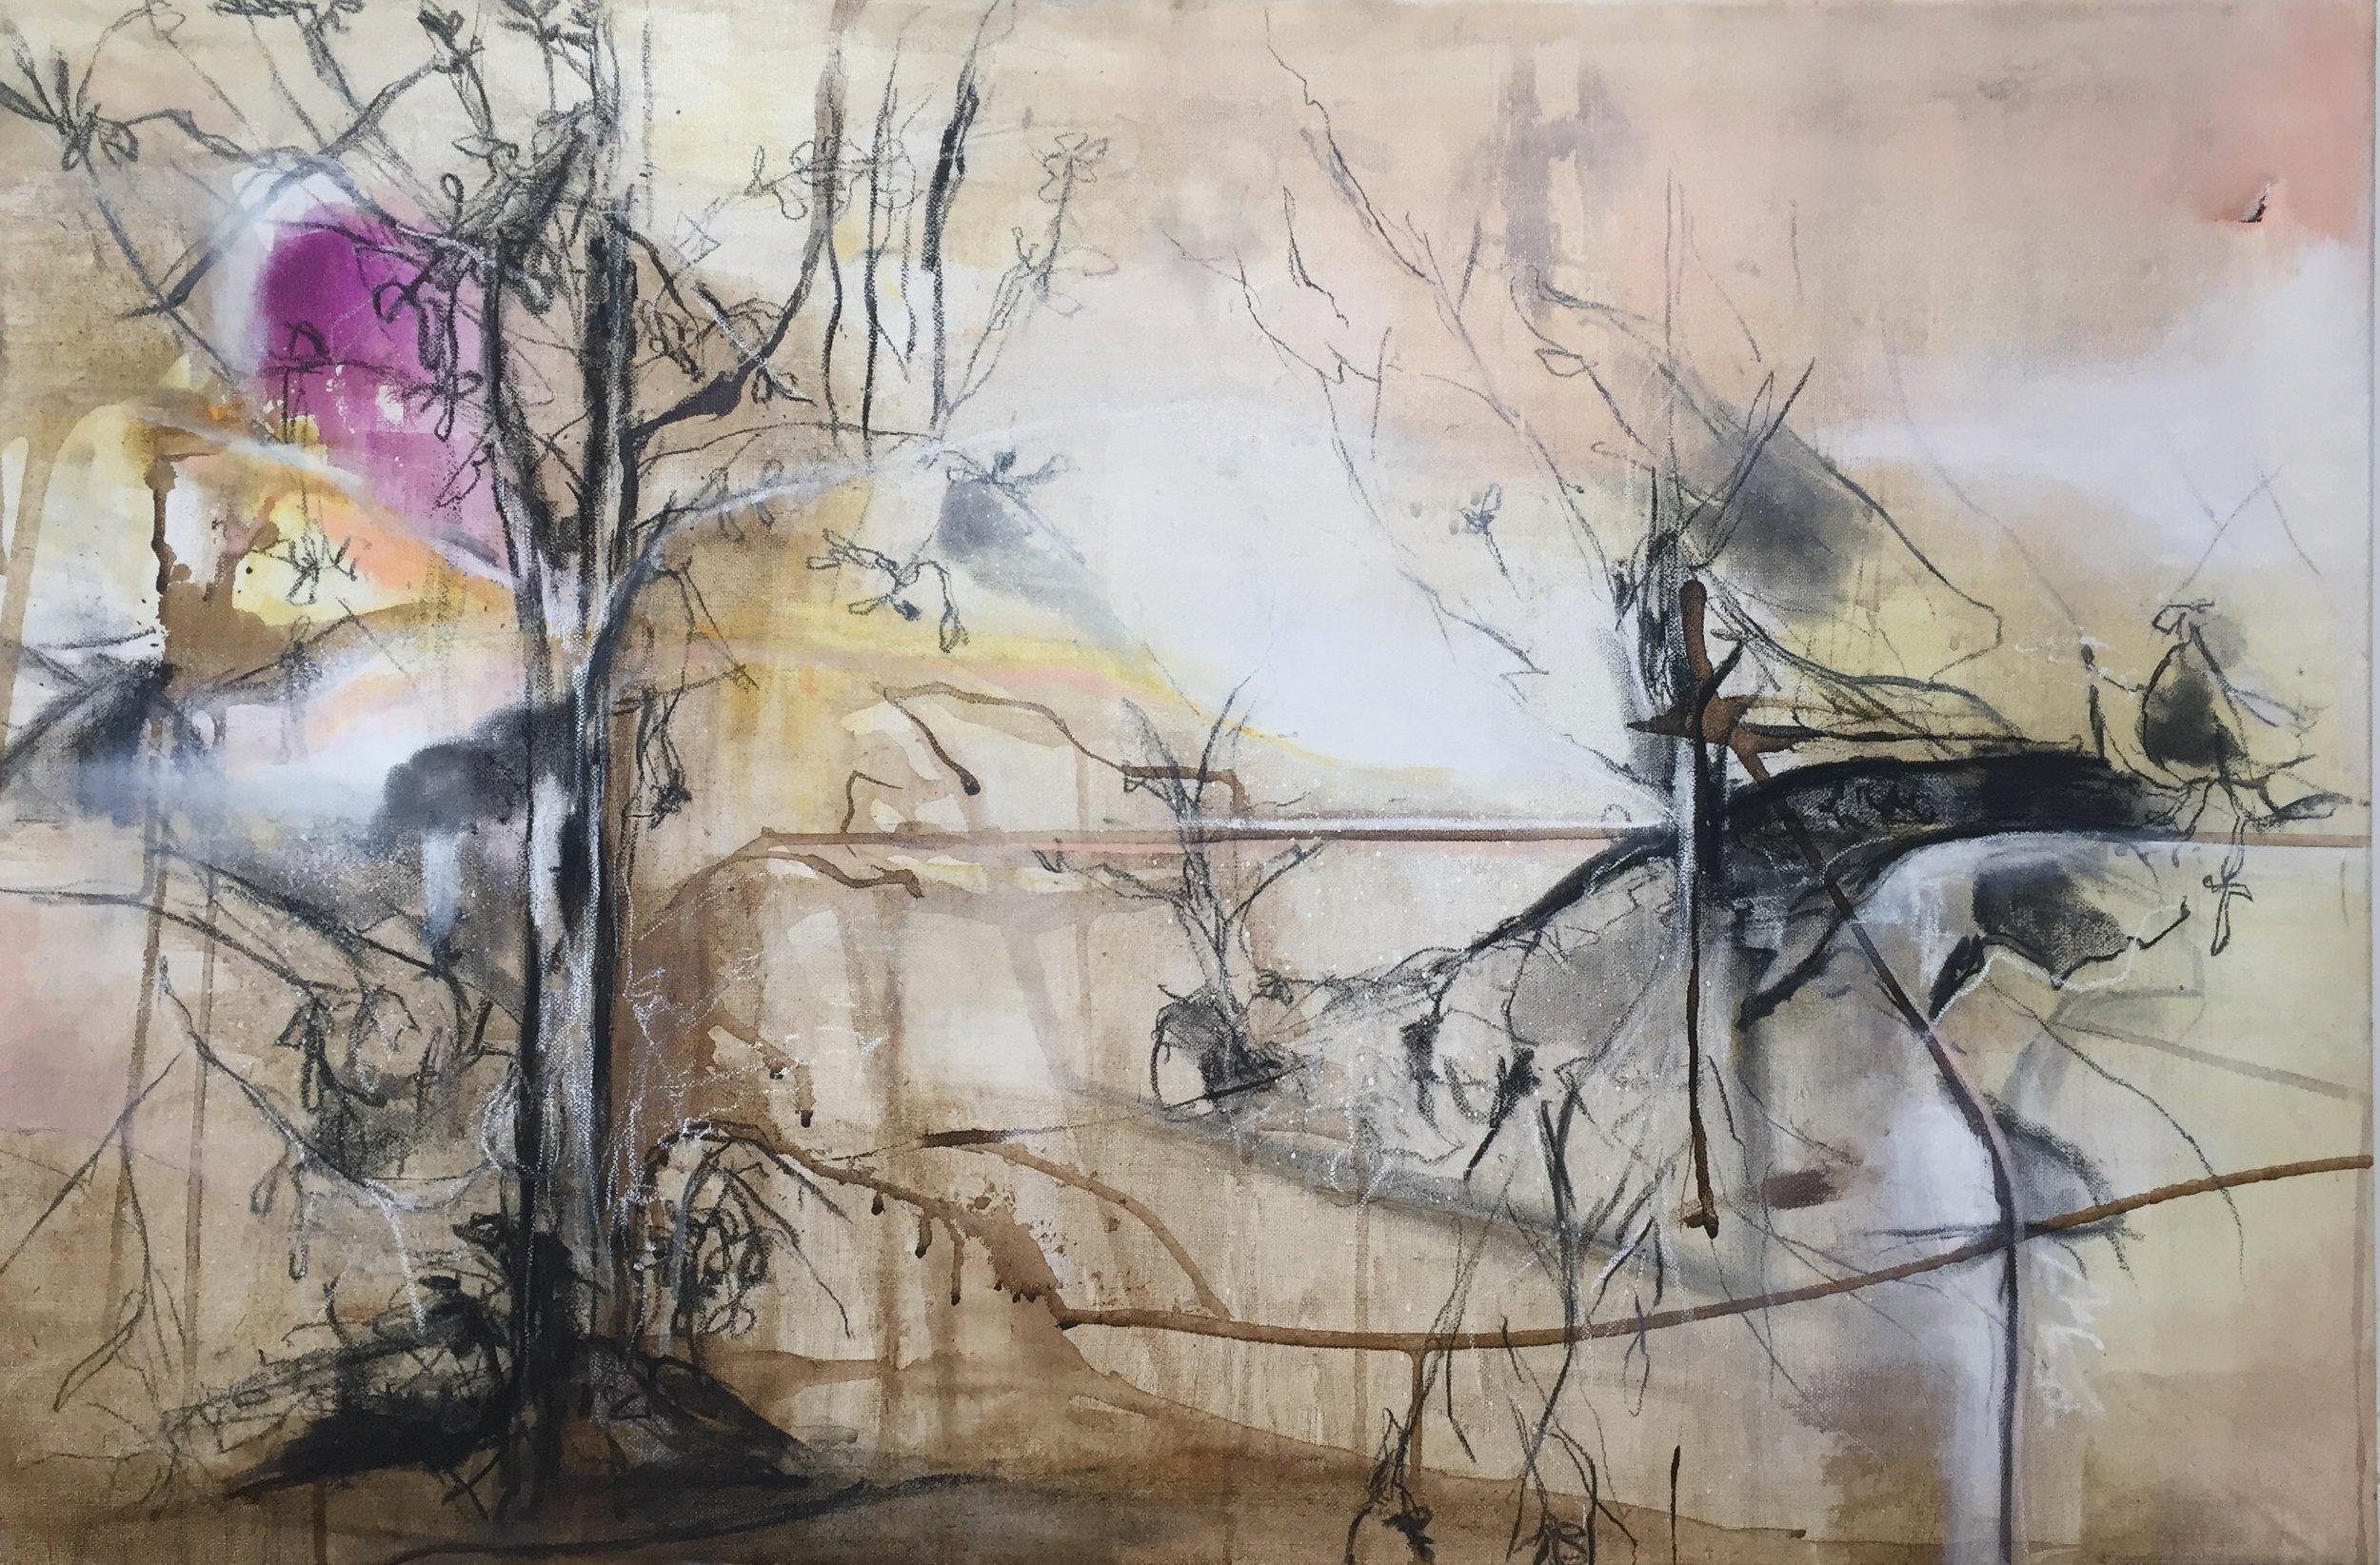 'Blind Folded' 90cm x 60cm Mixed Media on Canvas